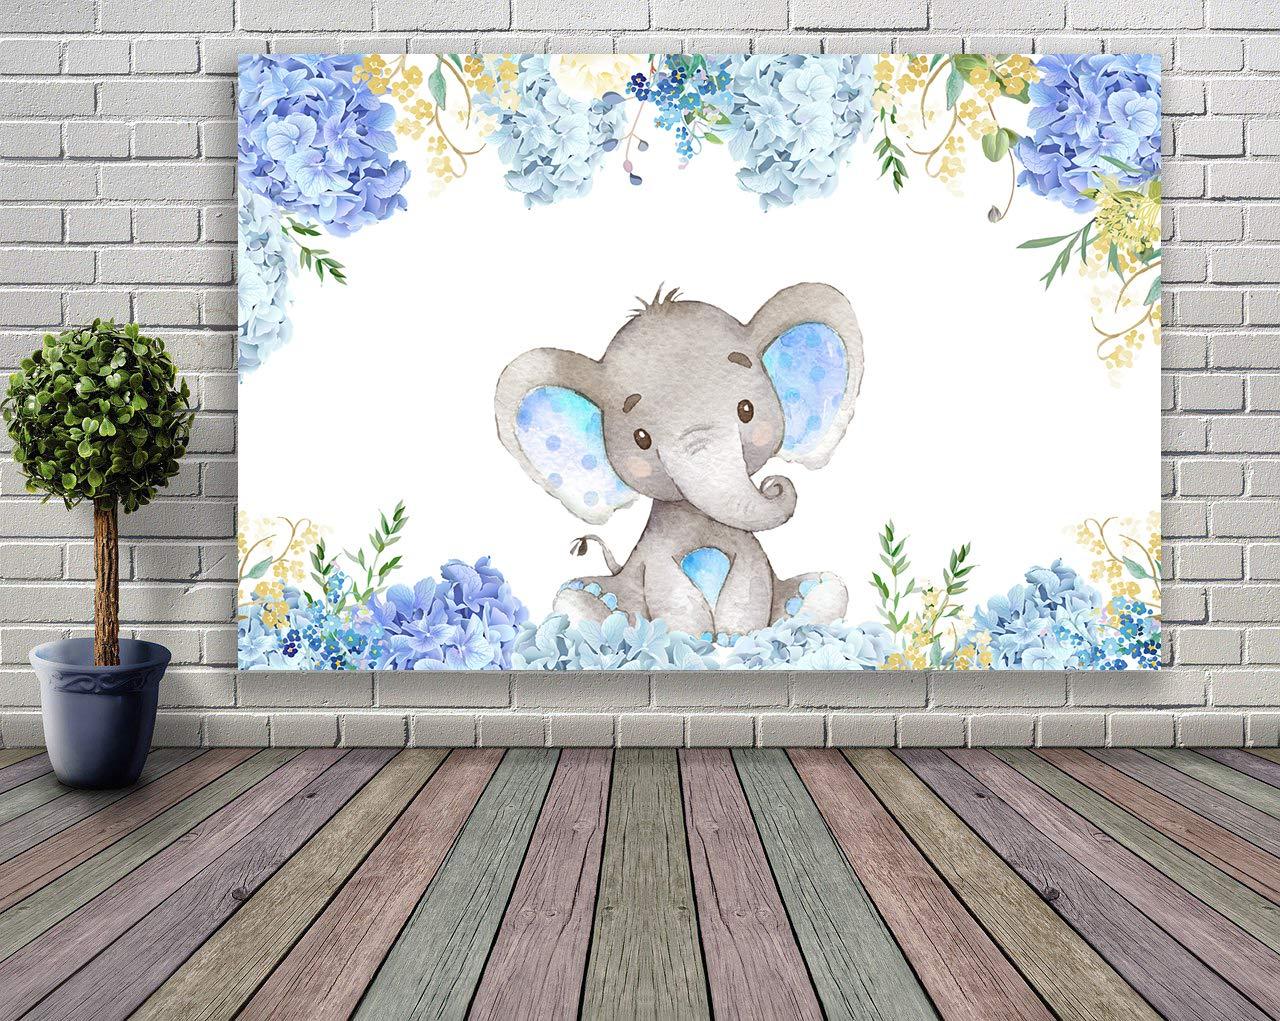 Mehofoto Wild One Backdrop 7x5ft Vinyl 1er Cumplea/ños Selva Safari Fotograf/ía Fondo Bosque Lindo Elefante Primera Fiesta de Cumplea/ños Foto Stand de fondo